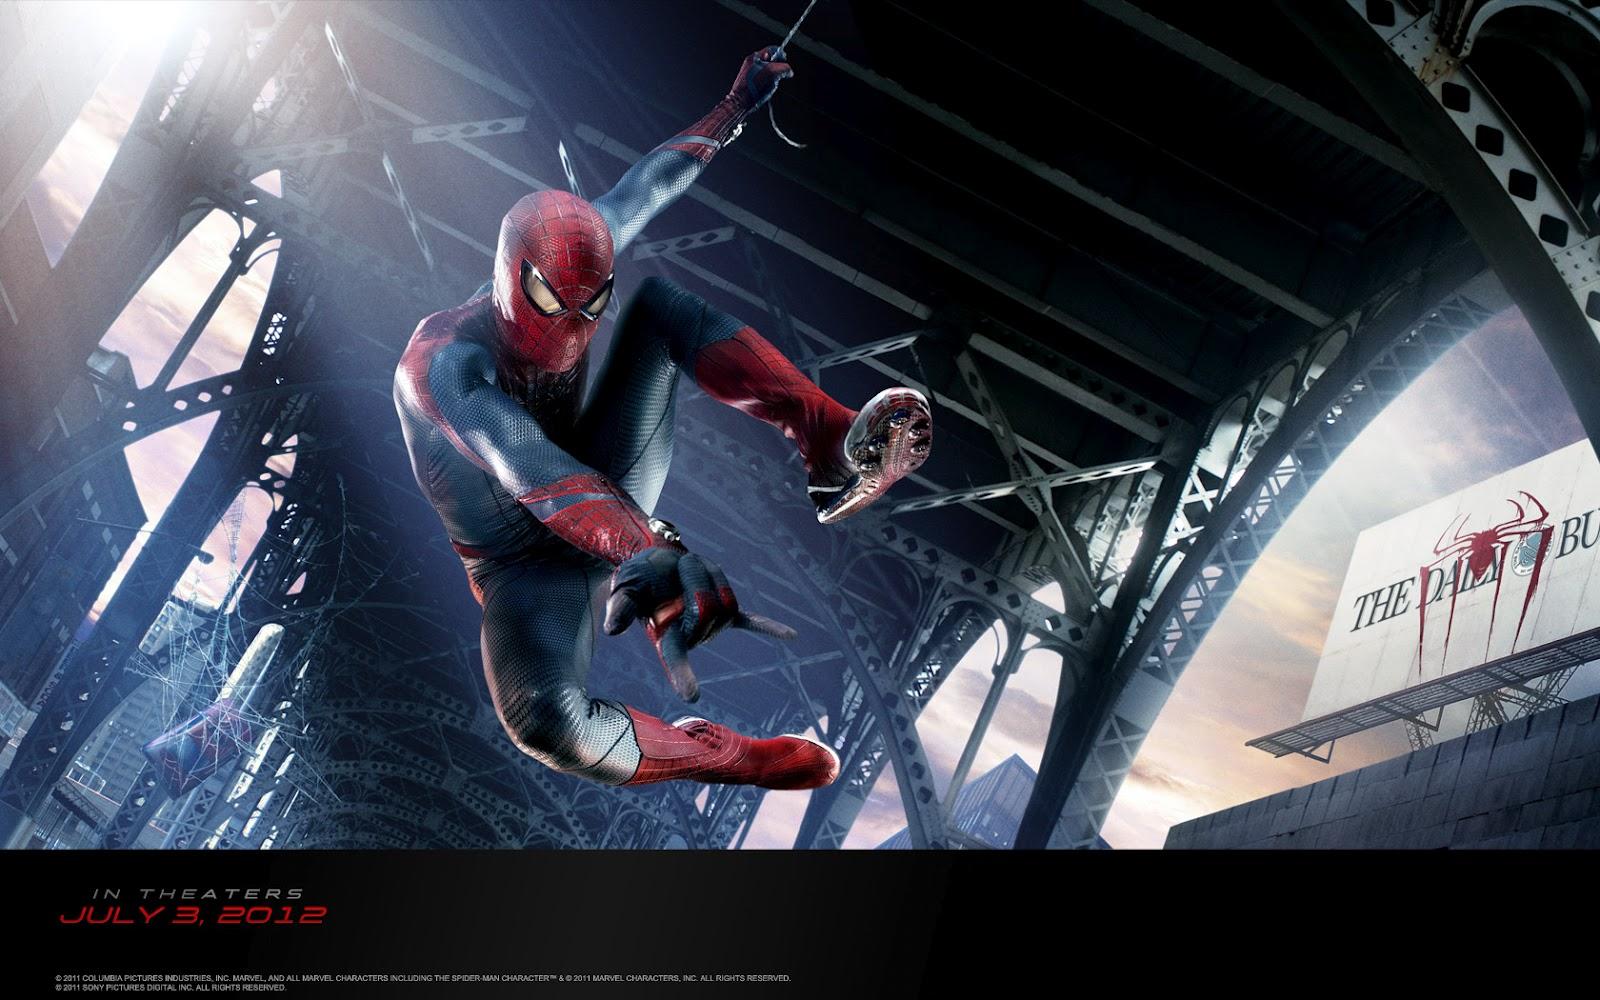 50 Spiderman Wallpapers For Windows 7 On Wallpapersafari